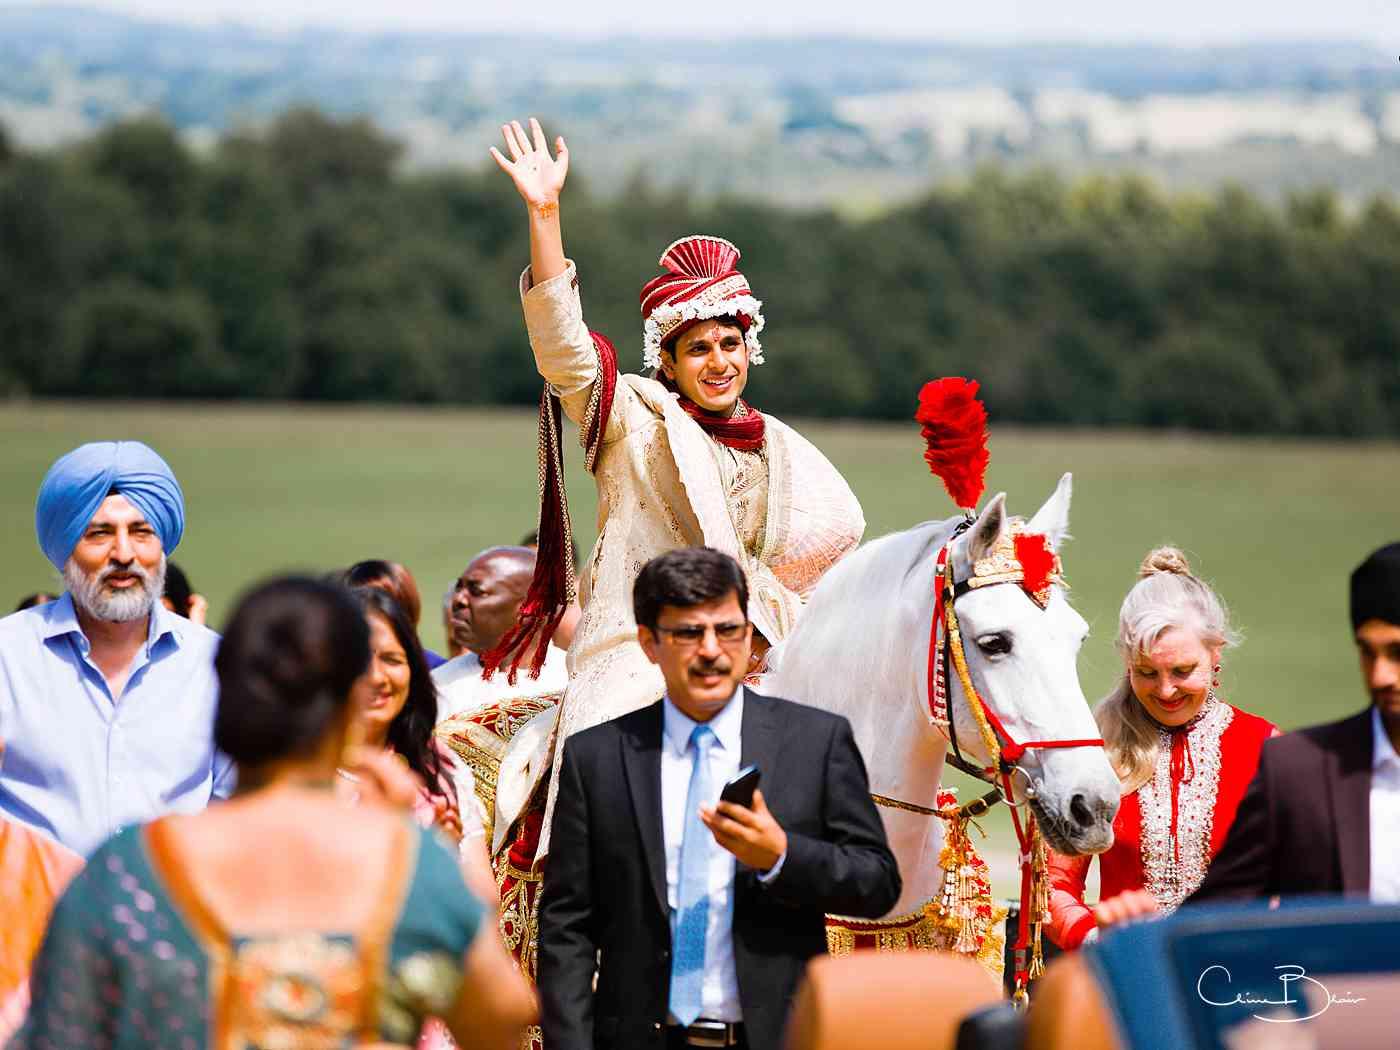 Indian groom on horseback